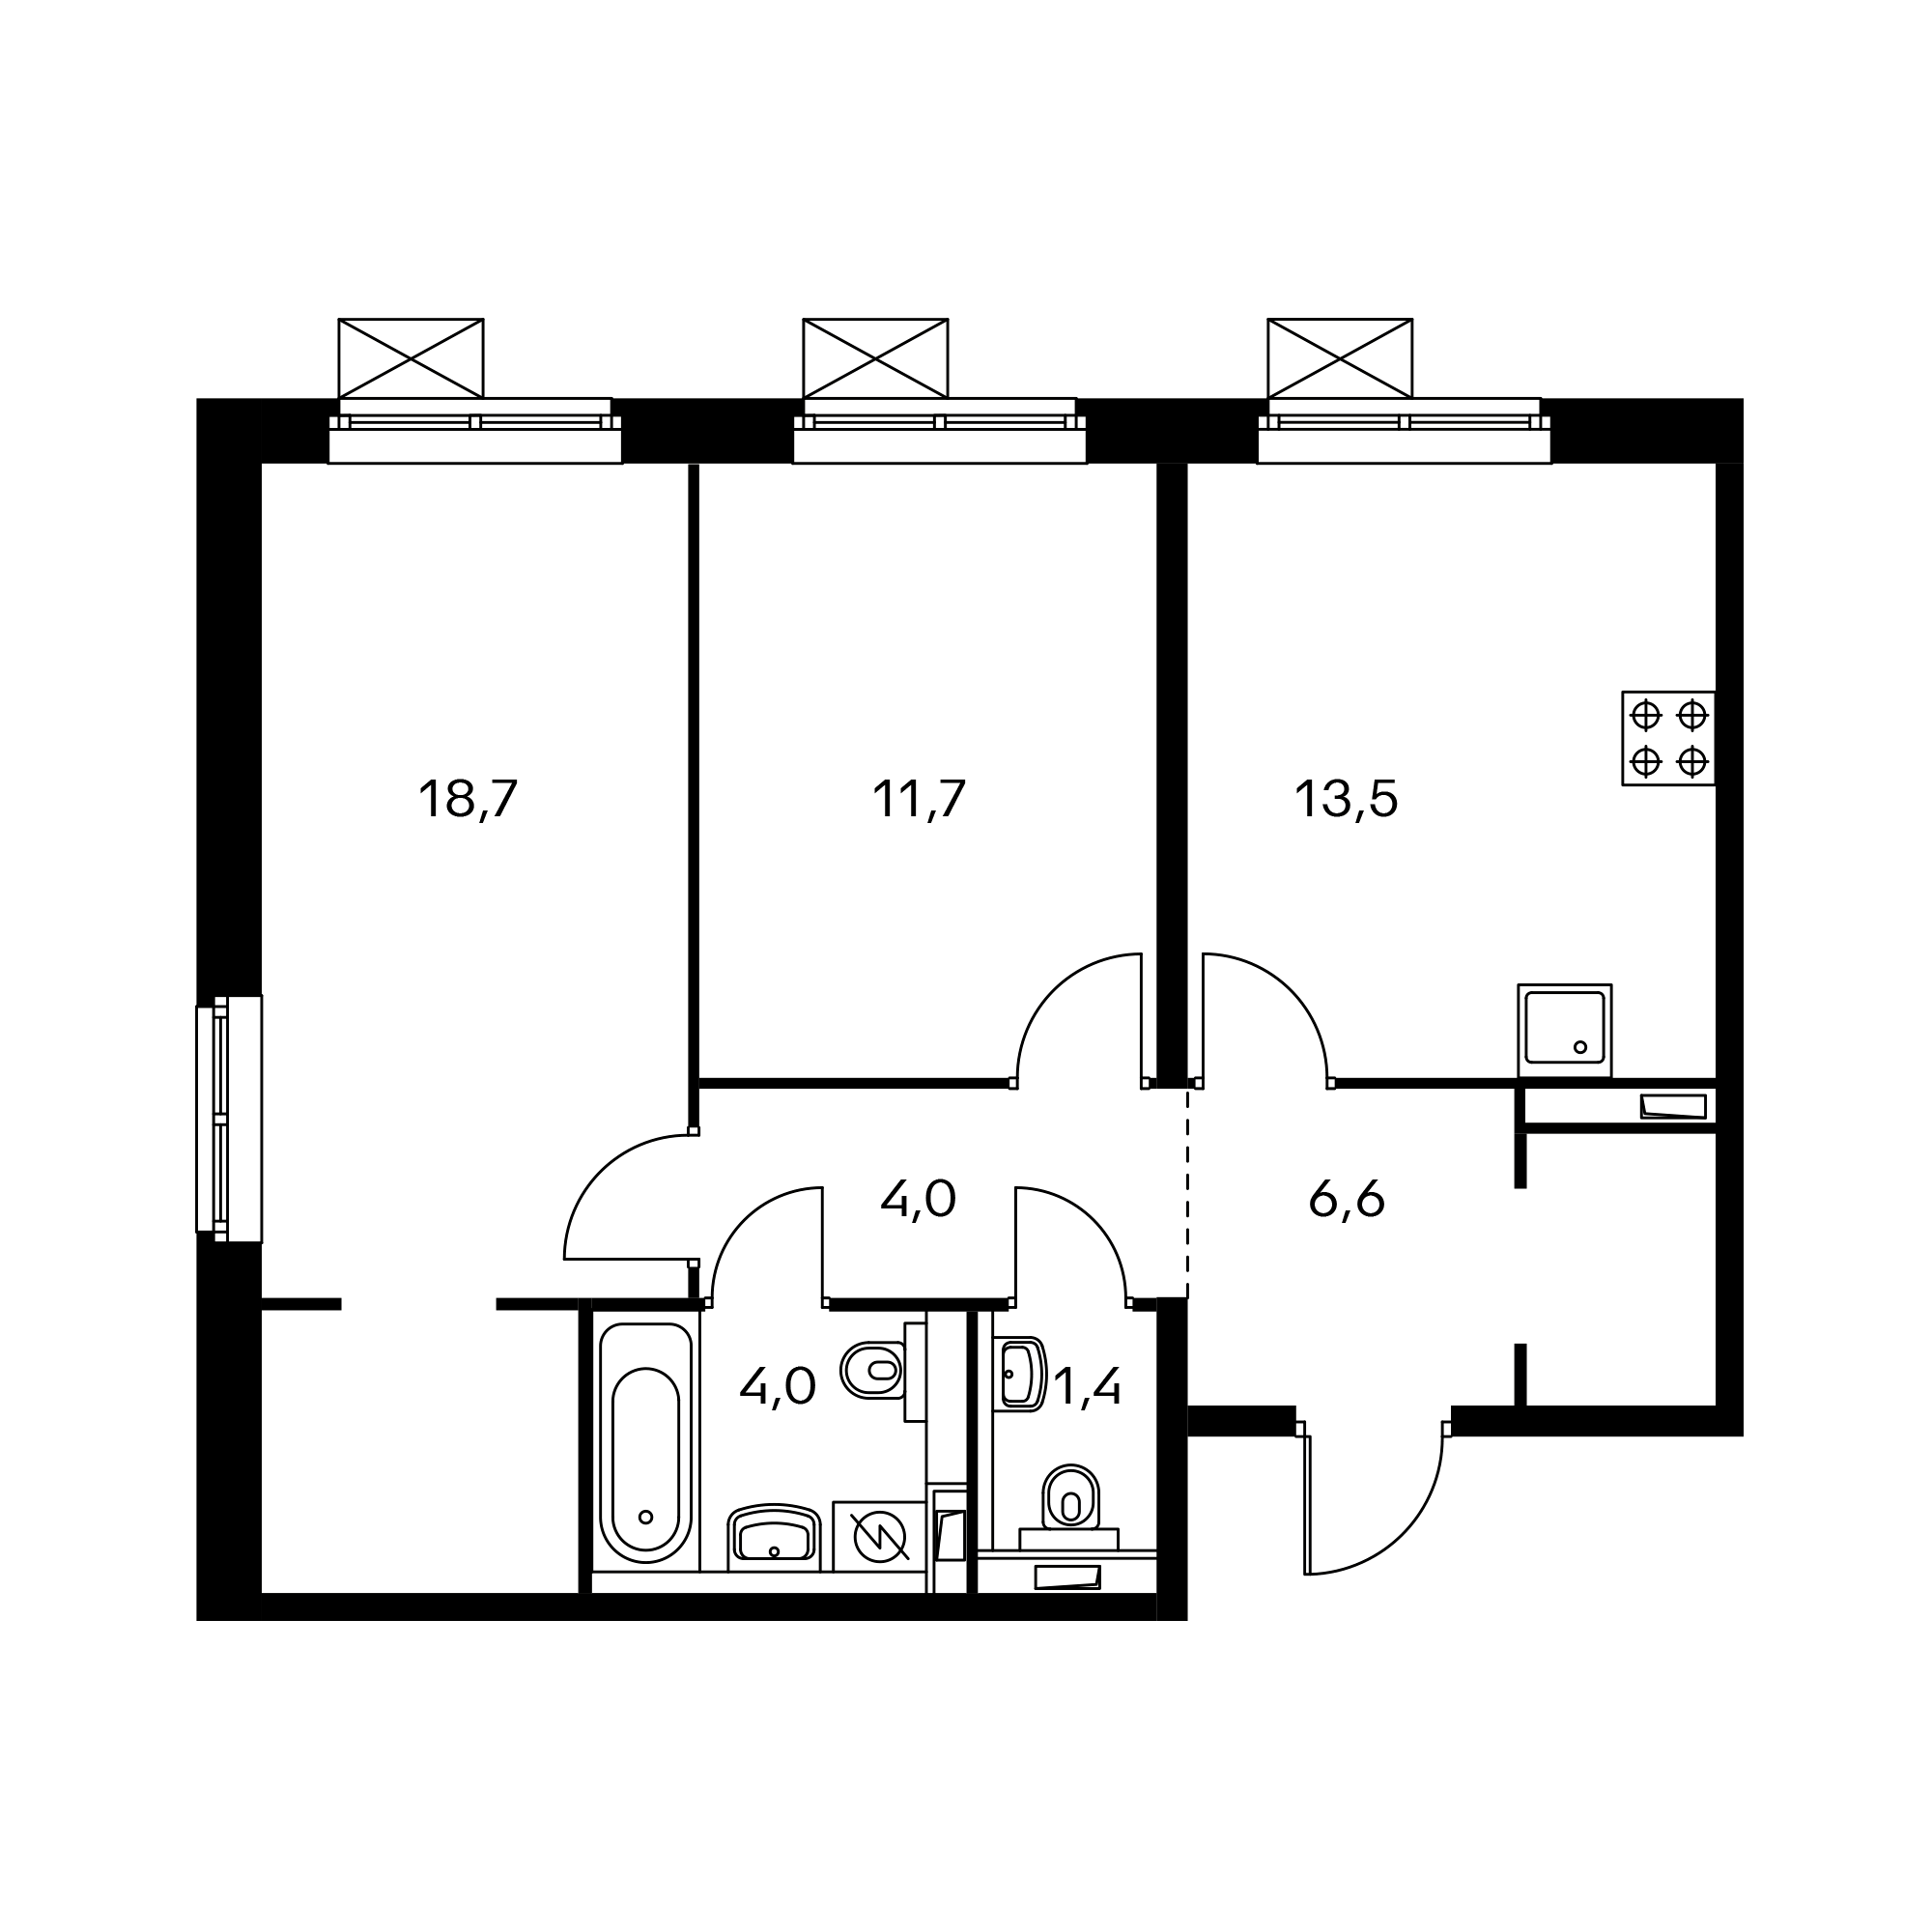 2KM4_9.6-1*